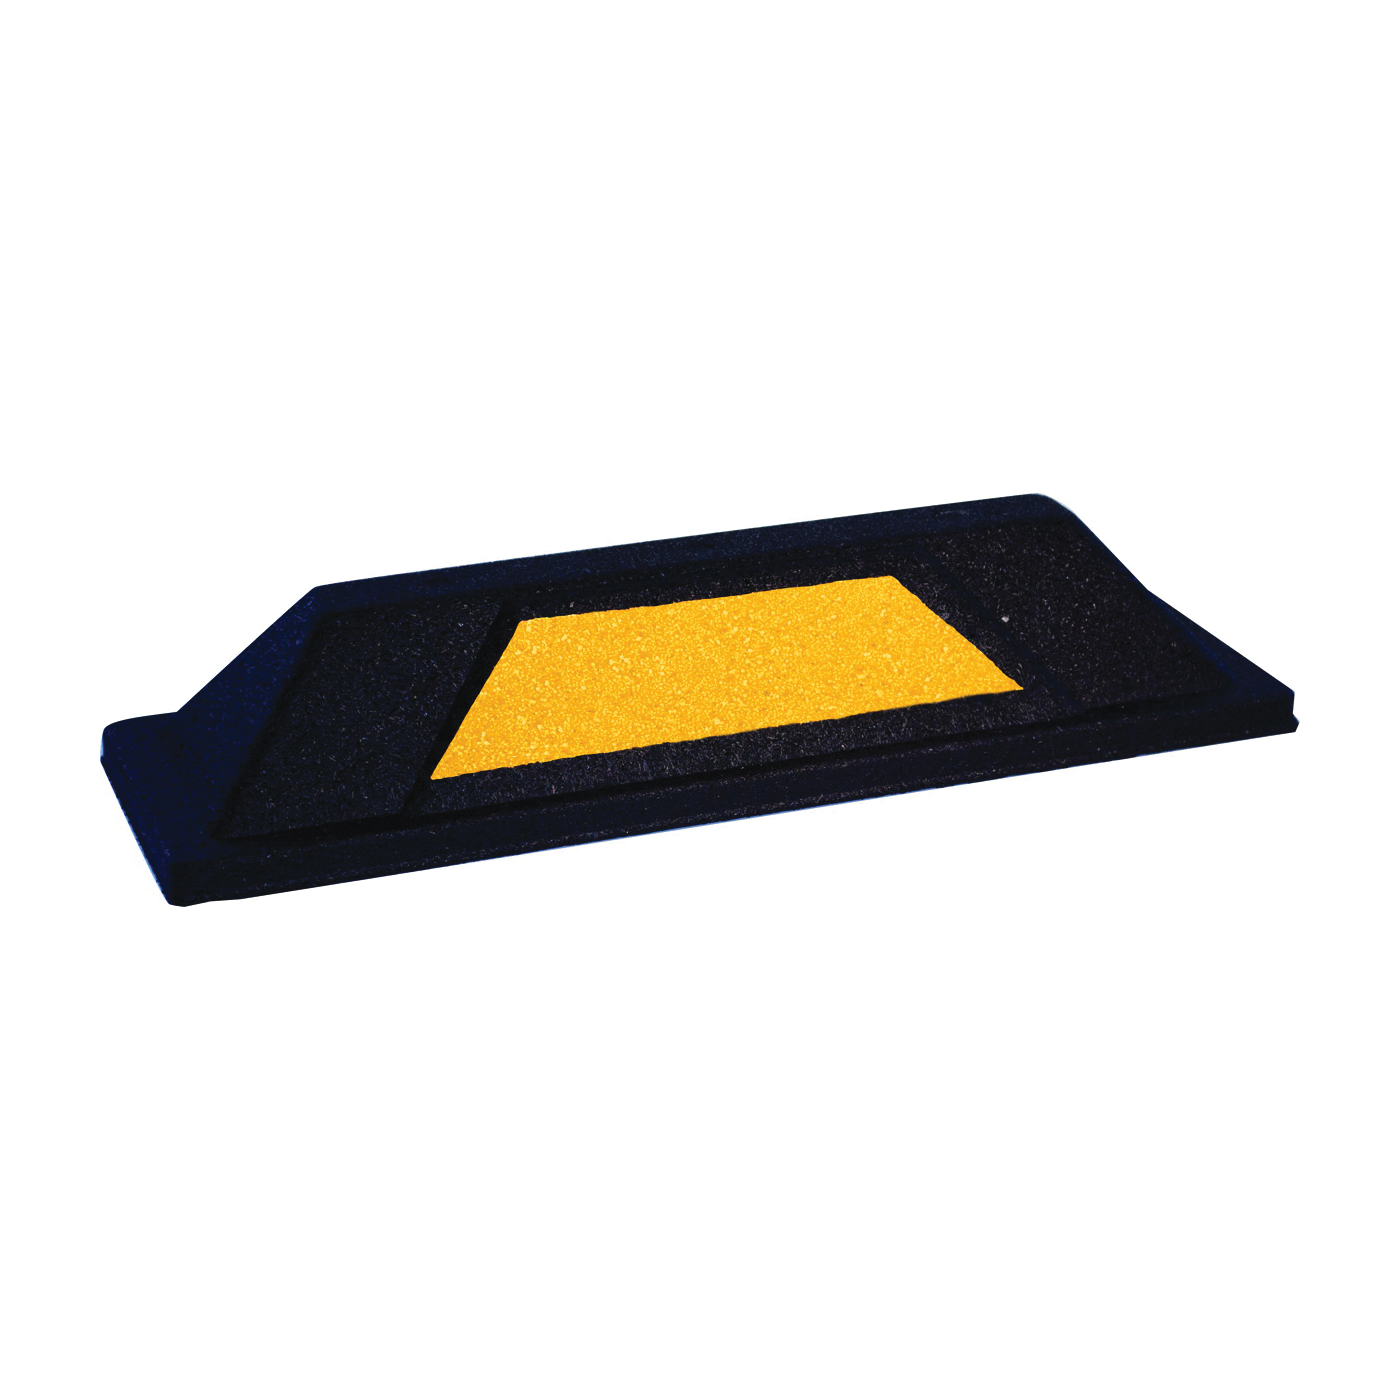 Picture of QRRI Secure Park TF375-6X20-SP Parking Stop, Rubber, Black/Yellow